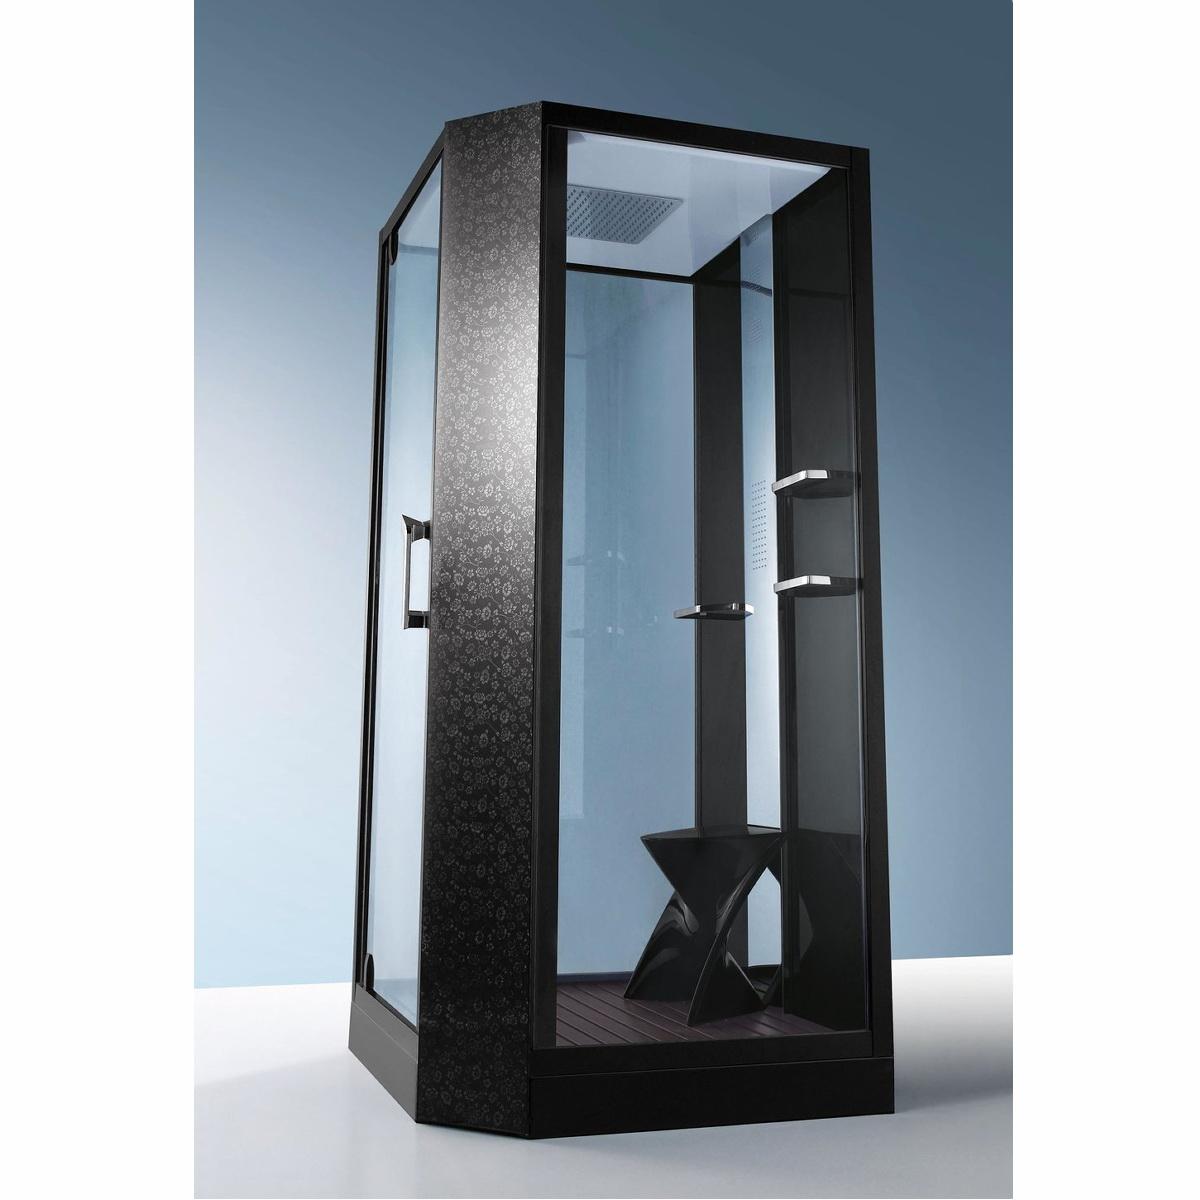 Душевая кабина Orans OLS-SR89101S, black 1000x1000x2200 мм.